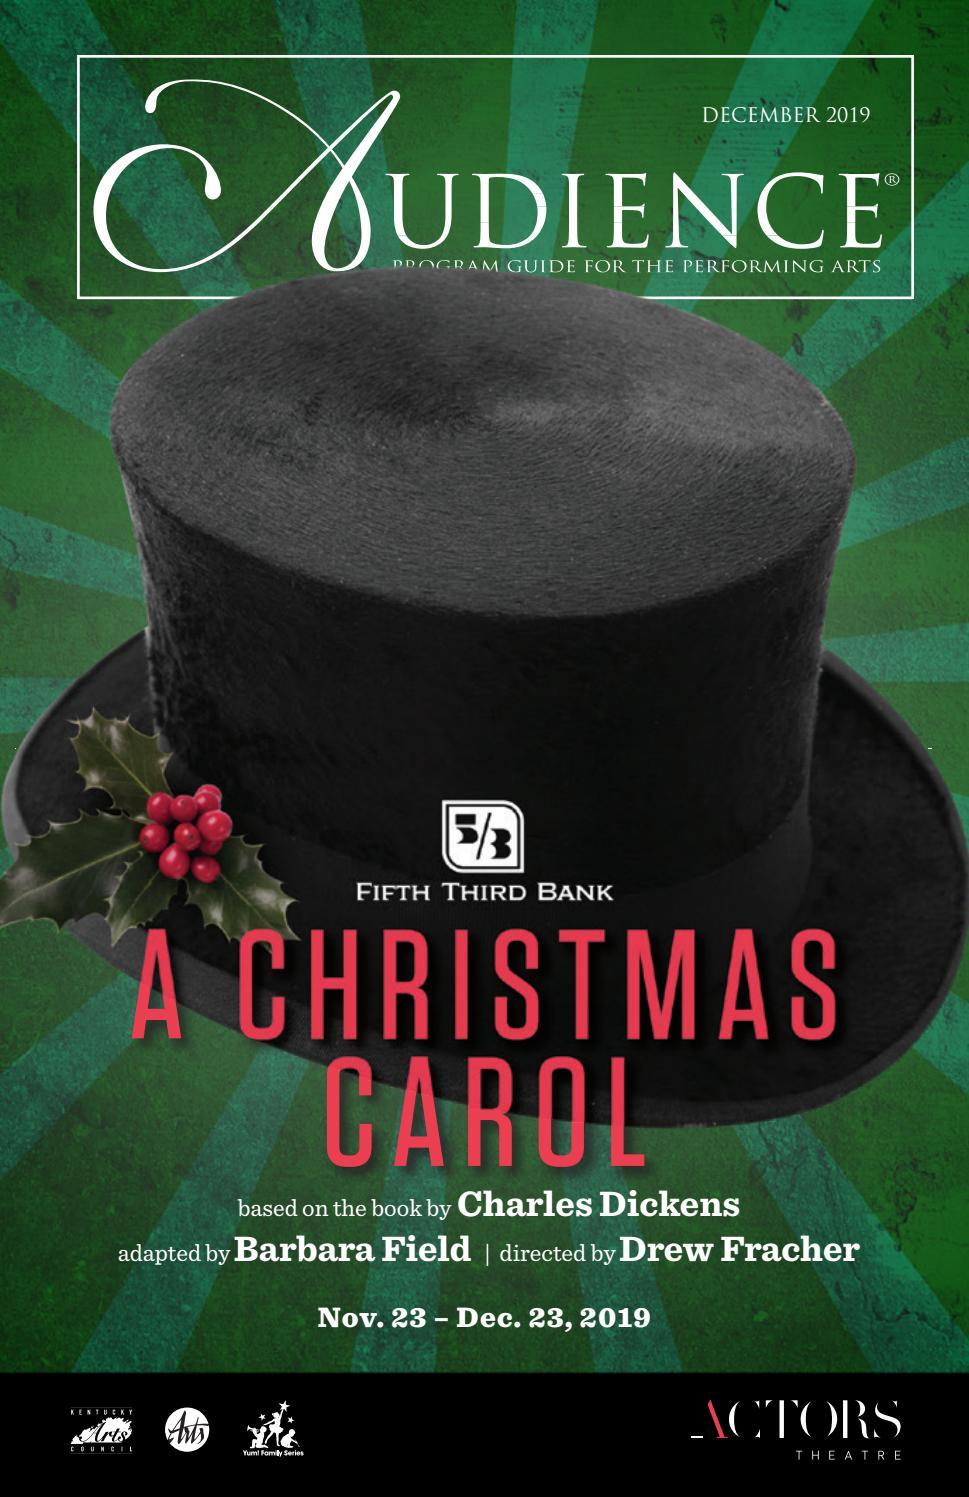 A Christmas Carol Minneapolis November 23 2020 Actors Theatre| November December 2019 | A Christmas Carol by